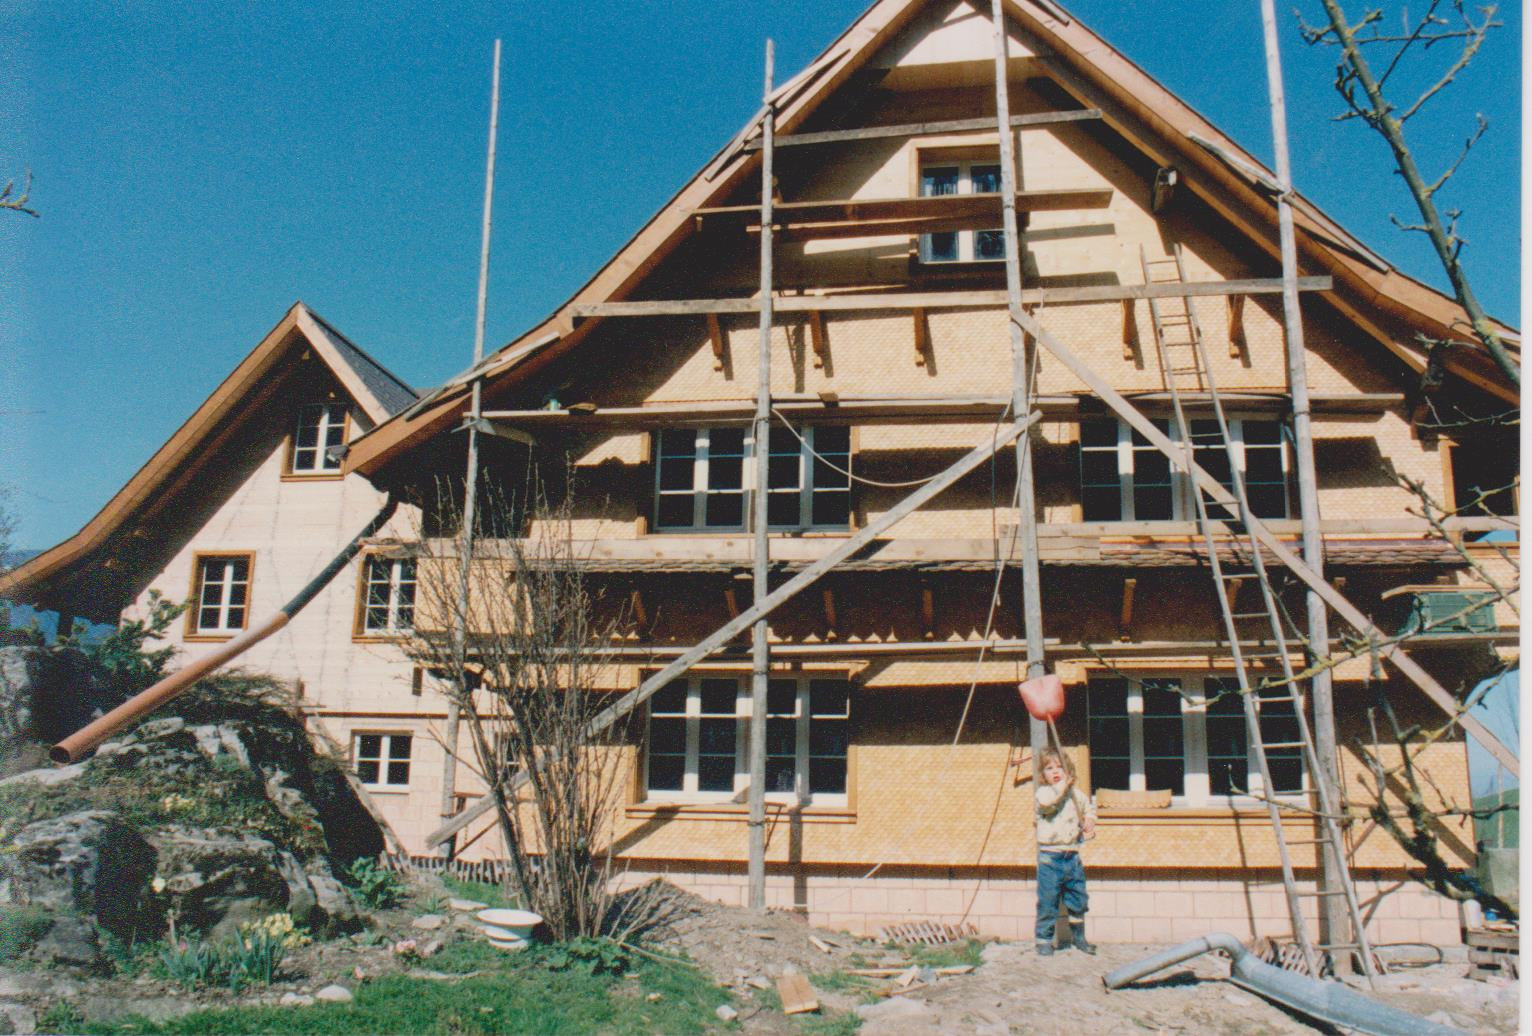 Umbau Wohnhaus 1994 inkl. Bauleiterin